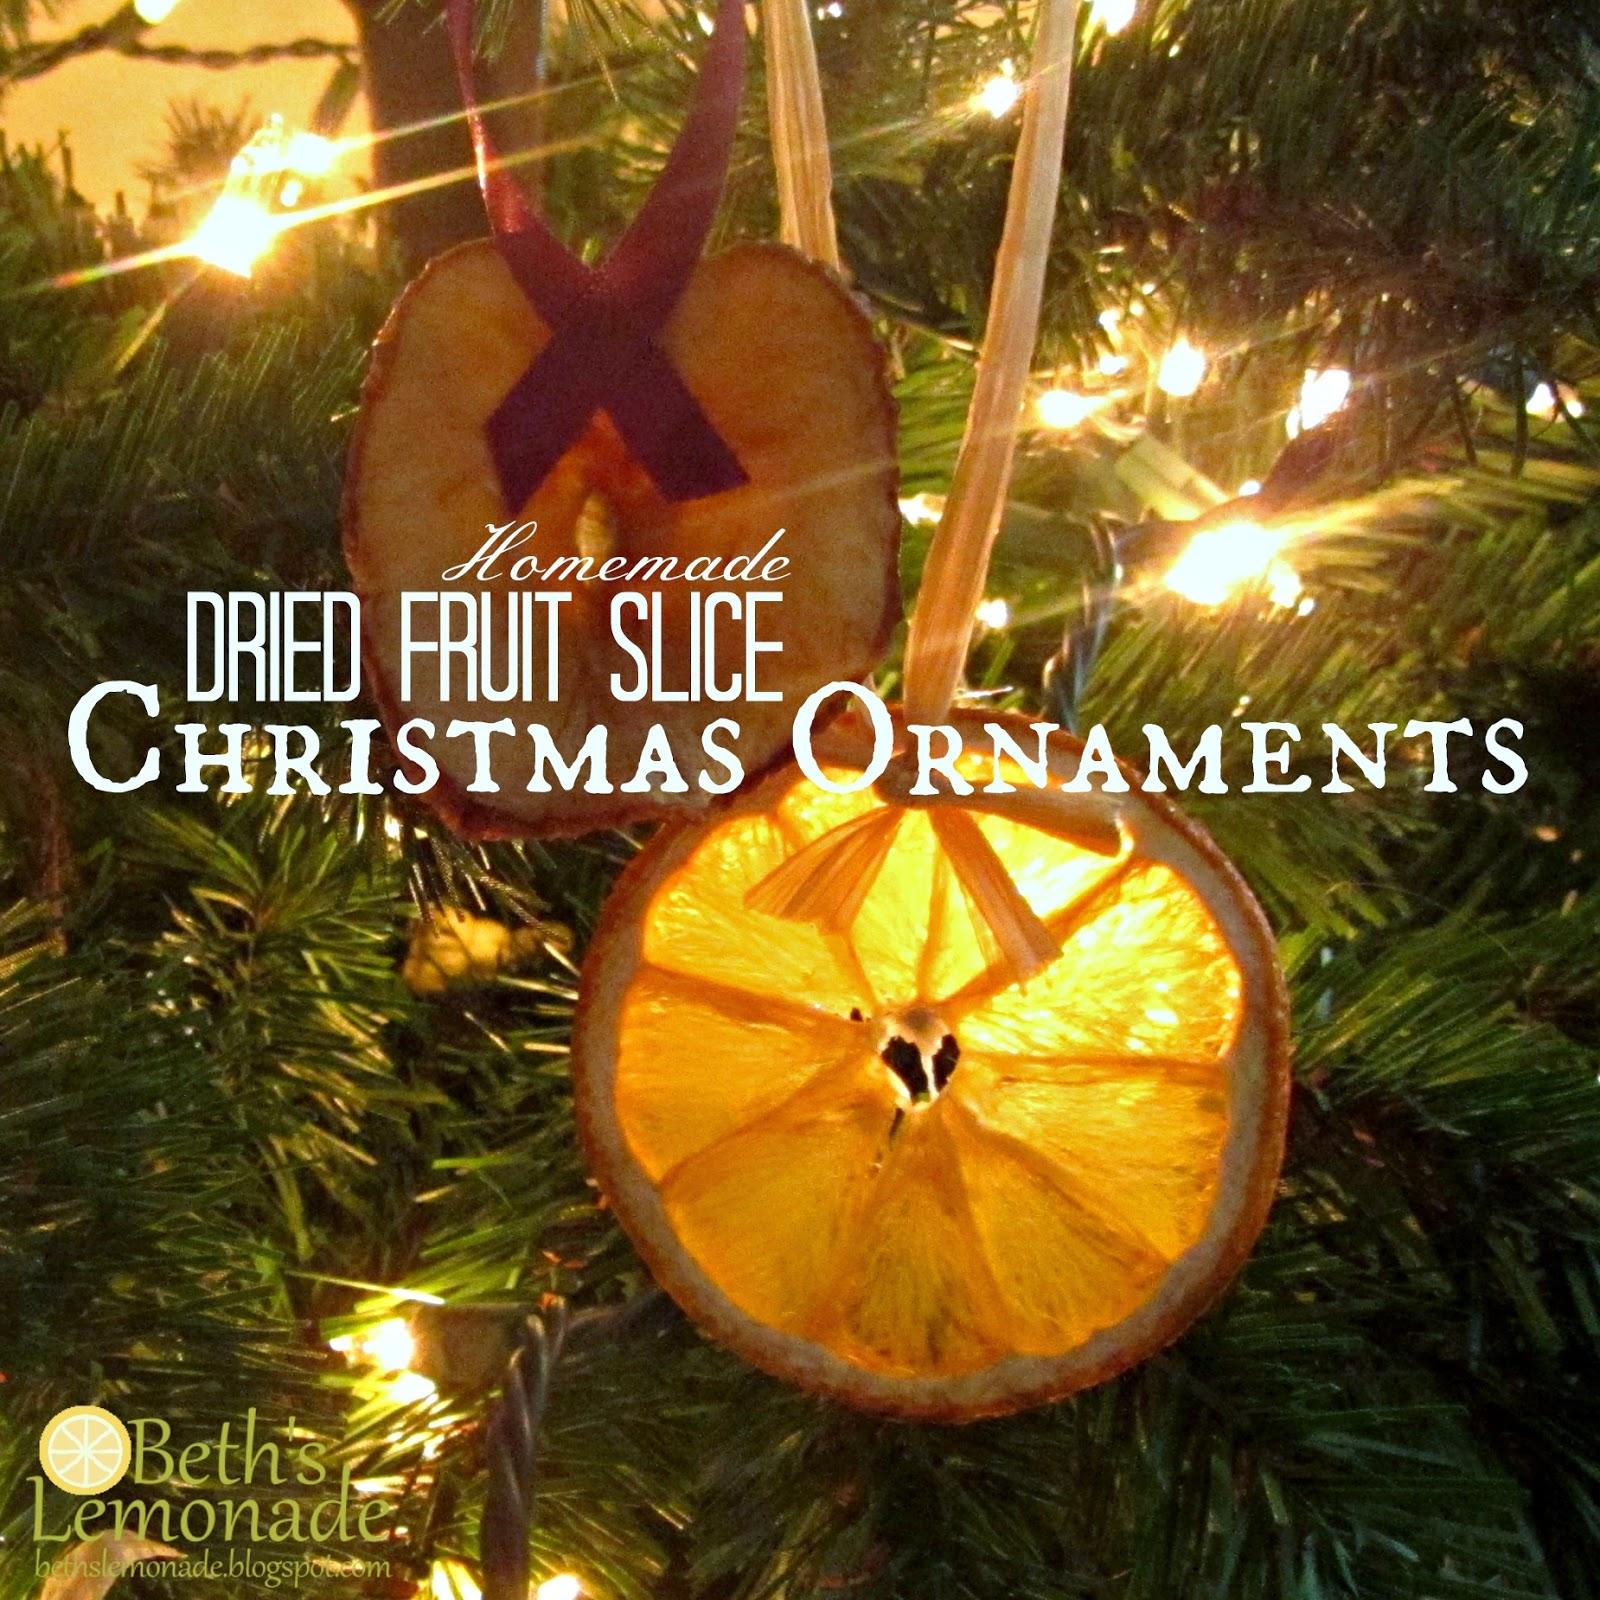 Christmas Tree Fruit Ornaments.Beth S Lemonade Rustic Homemade Christmas Tree Homemade